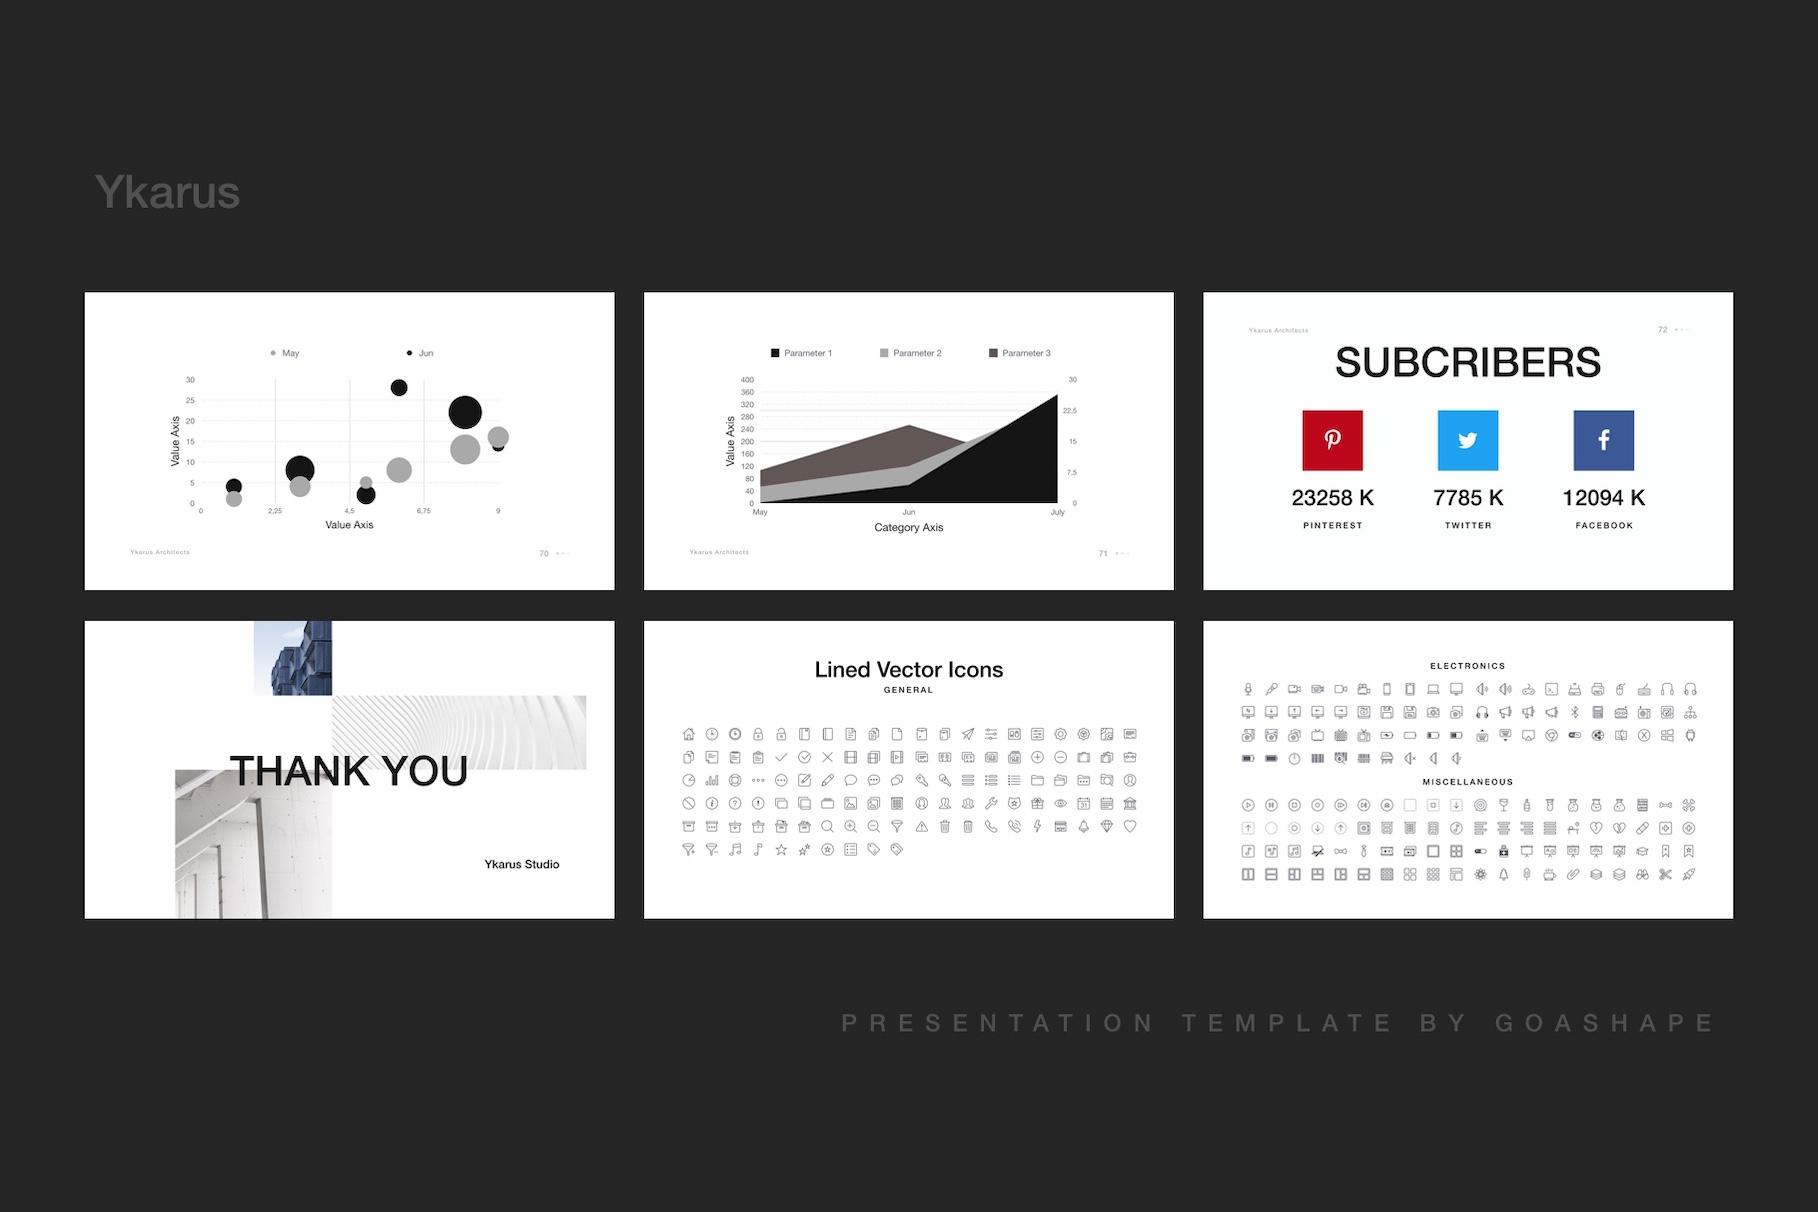 Ykarus Keynote Presentation Template example image 3